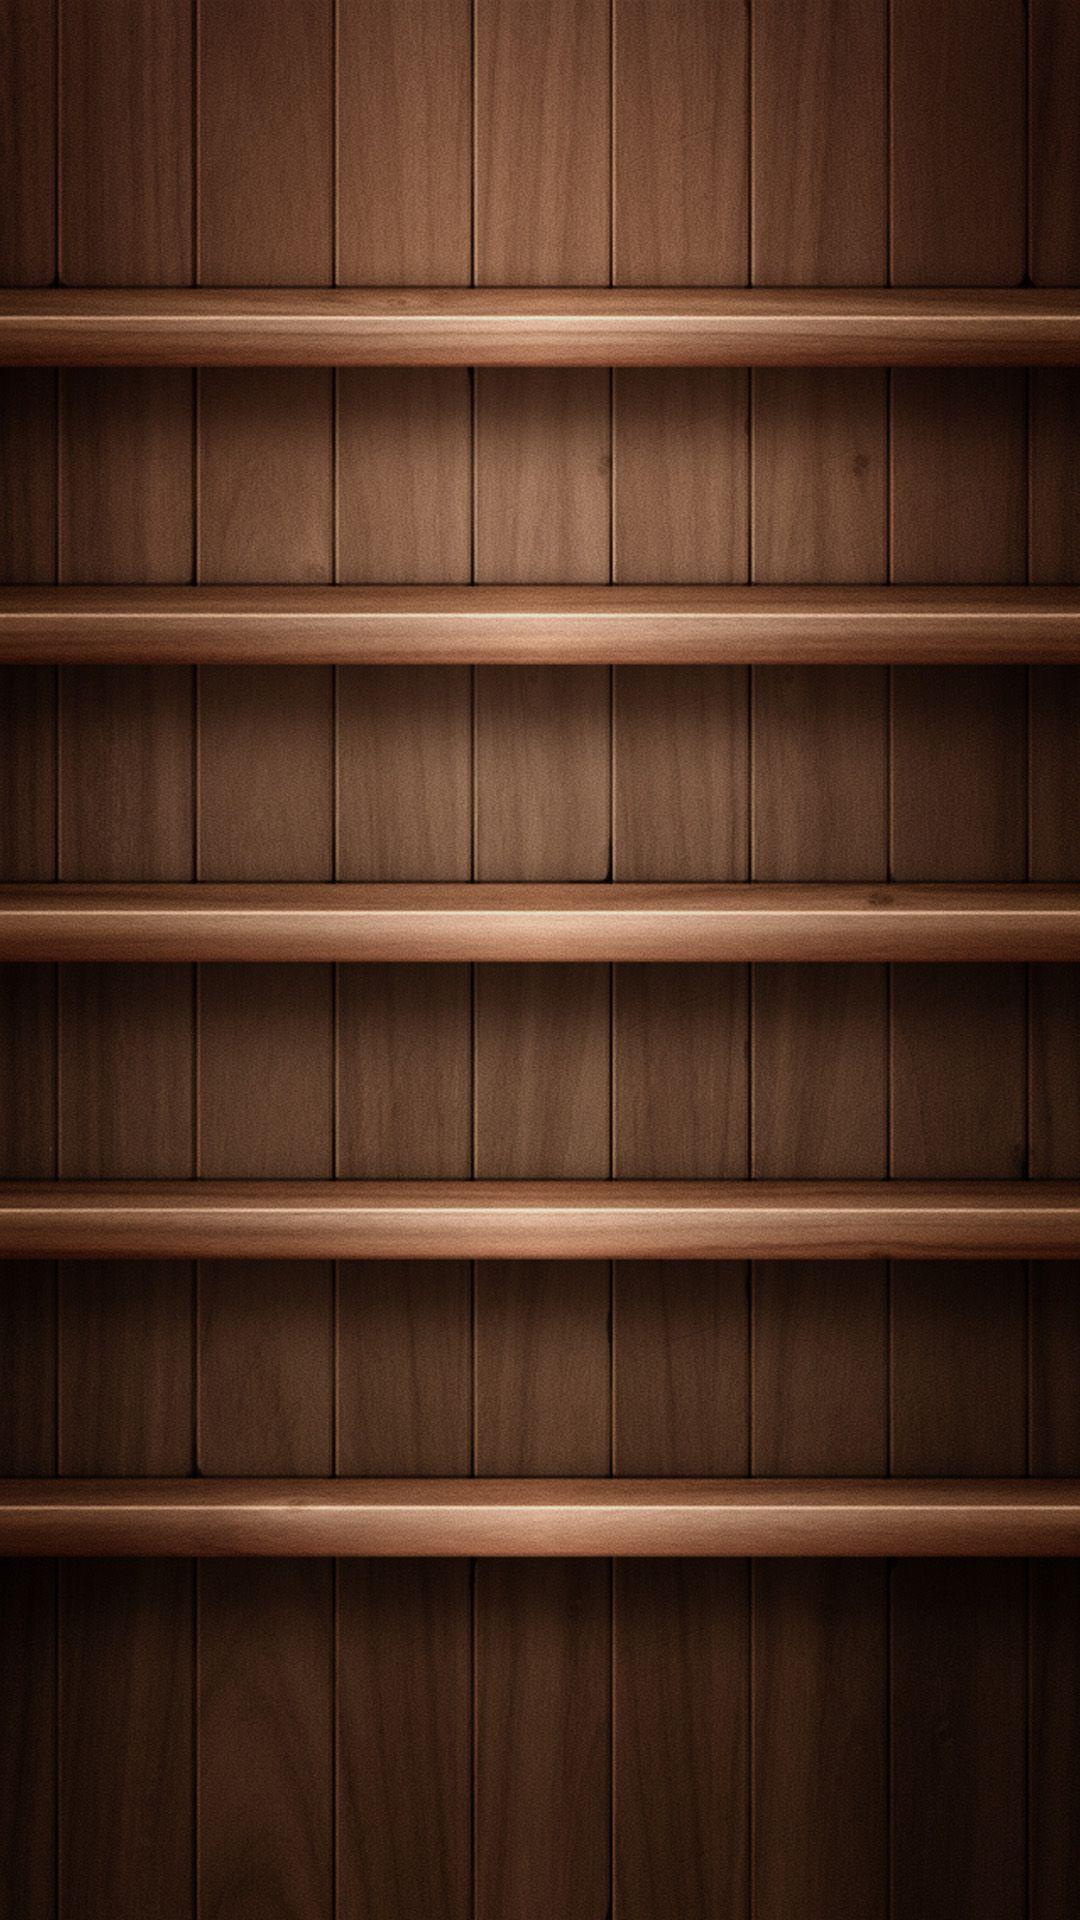 Brown Iphone Wallpapers On Wallpaperdog